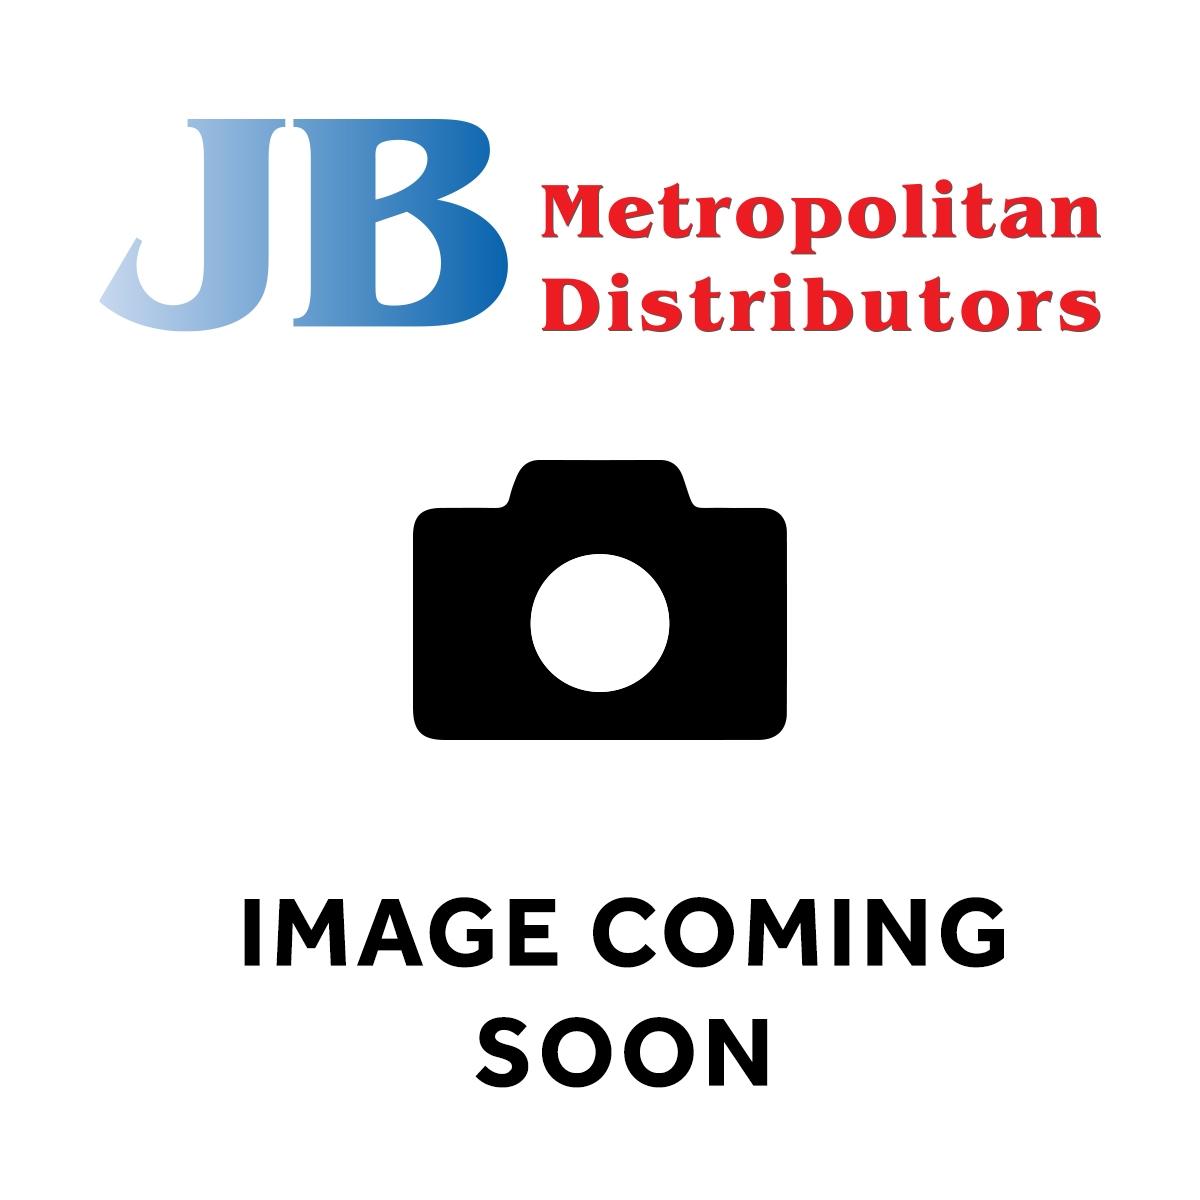 100G OAT SLICE YOGHURT BLUEBERRY CRANBERRY